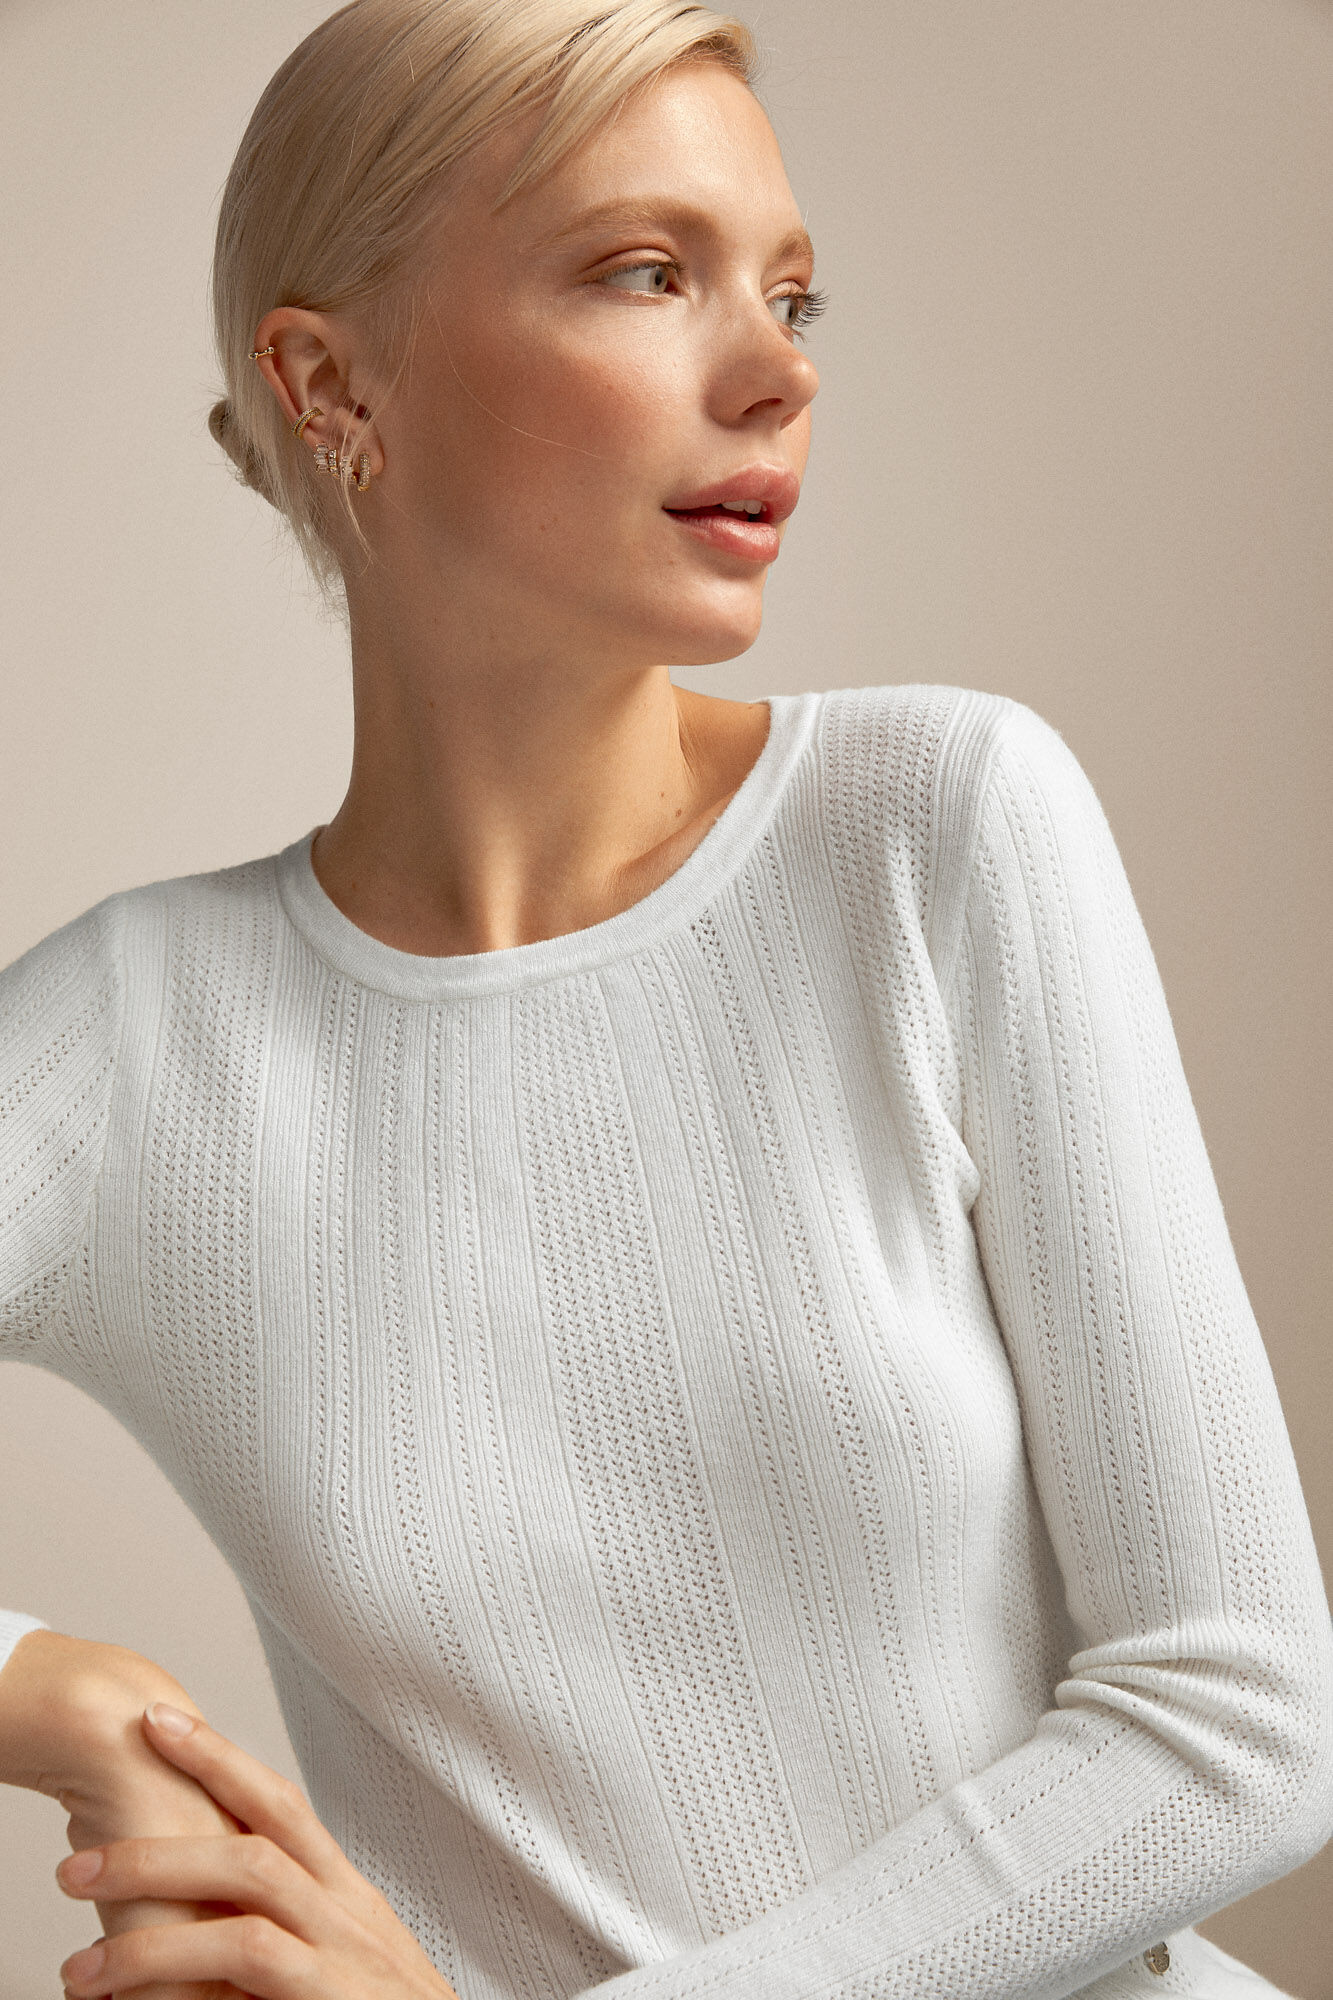 Sweater gola caixa renda | Malhas e cardigans | Cortefiel